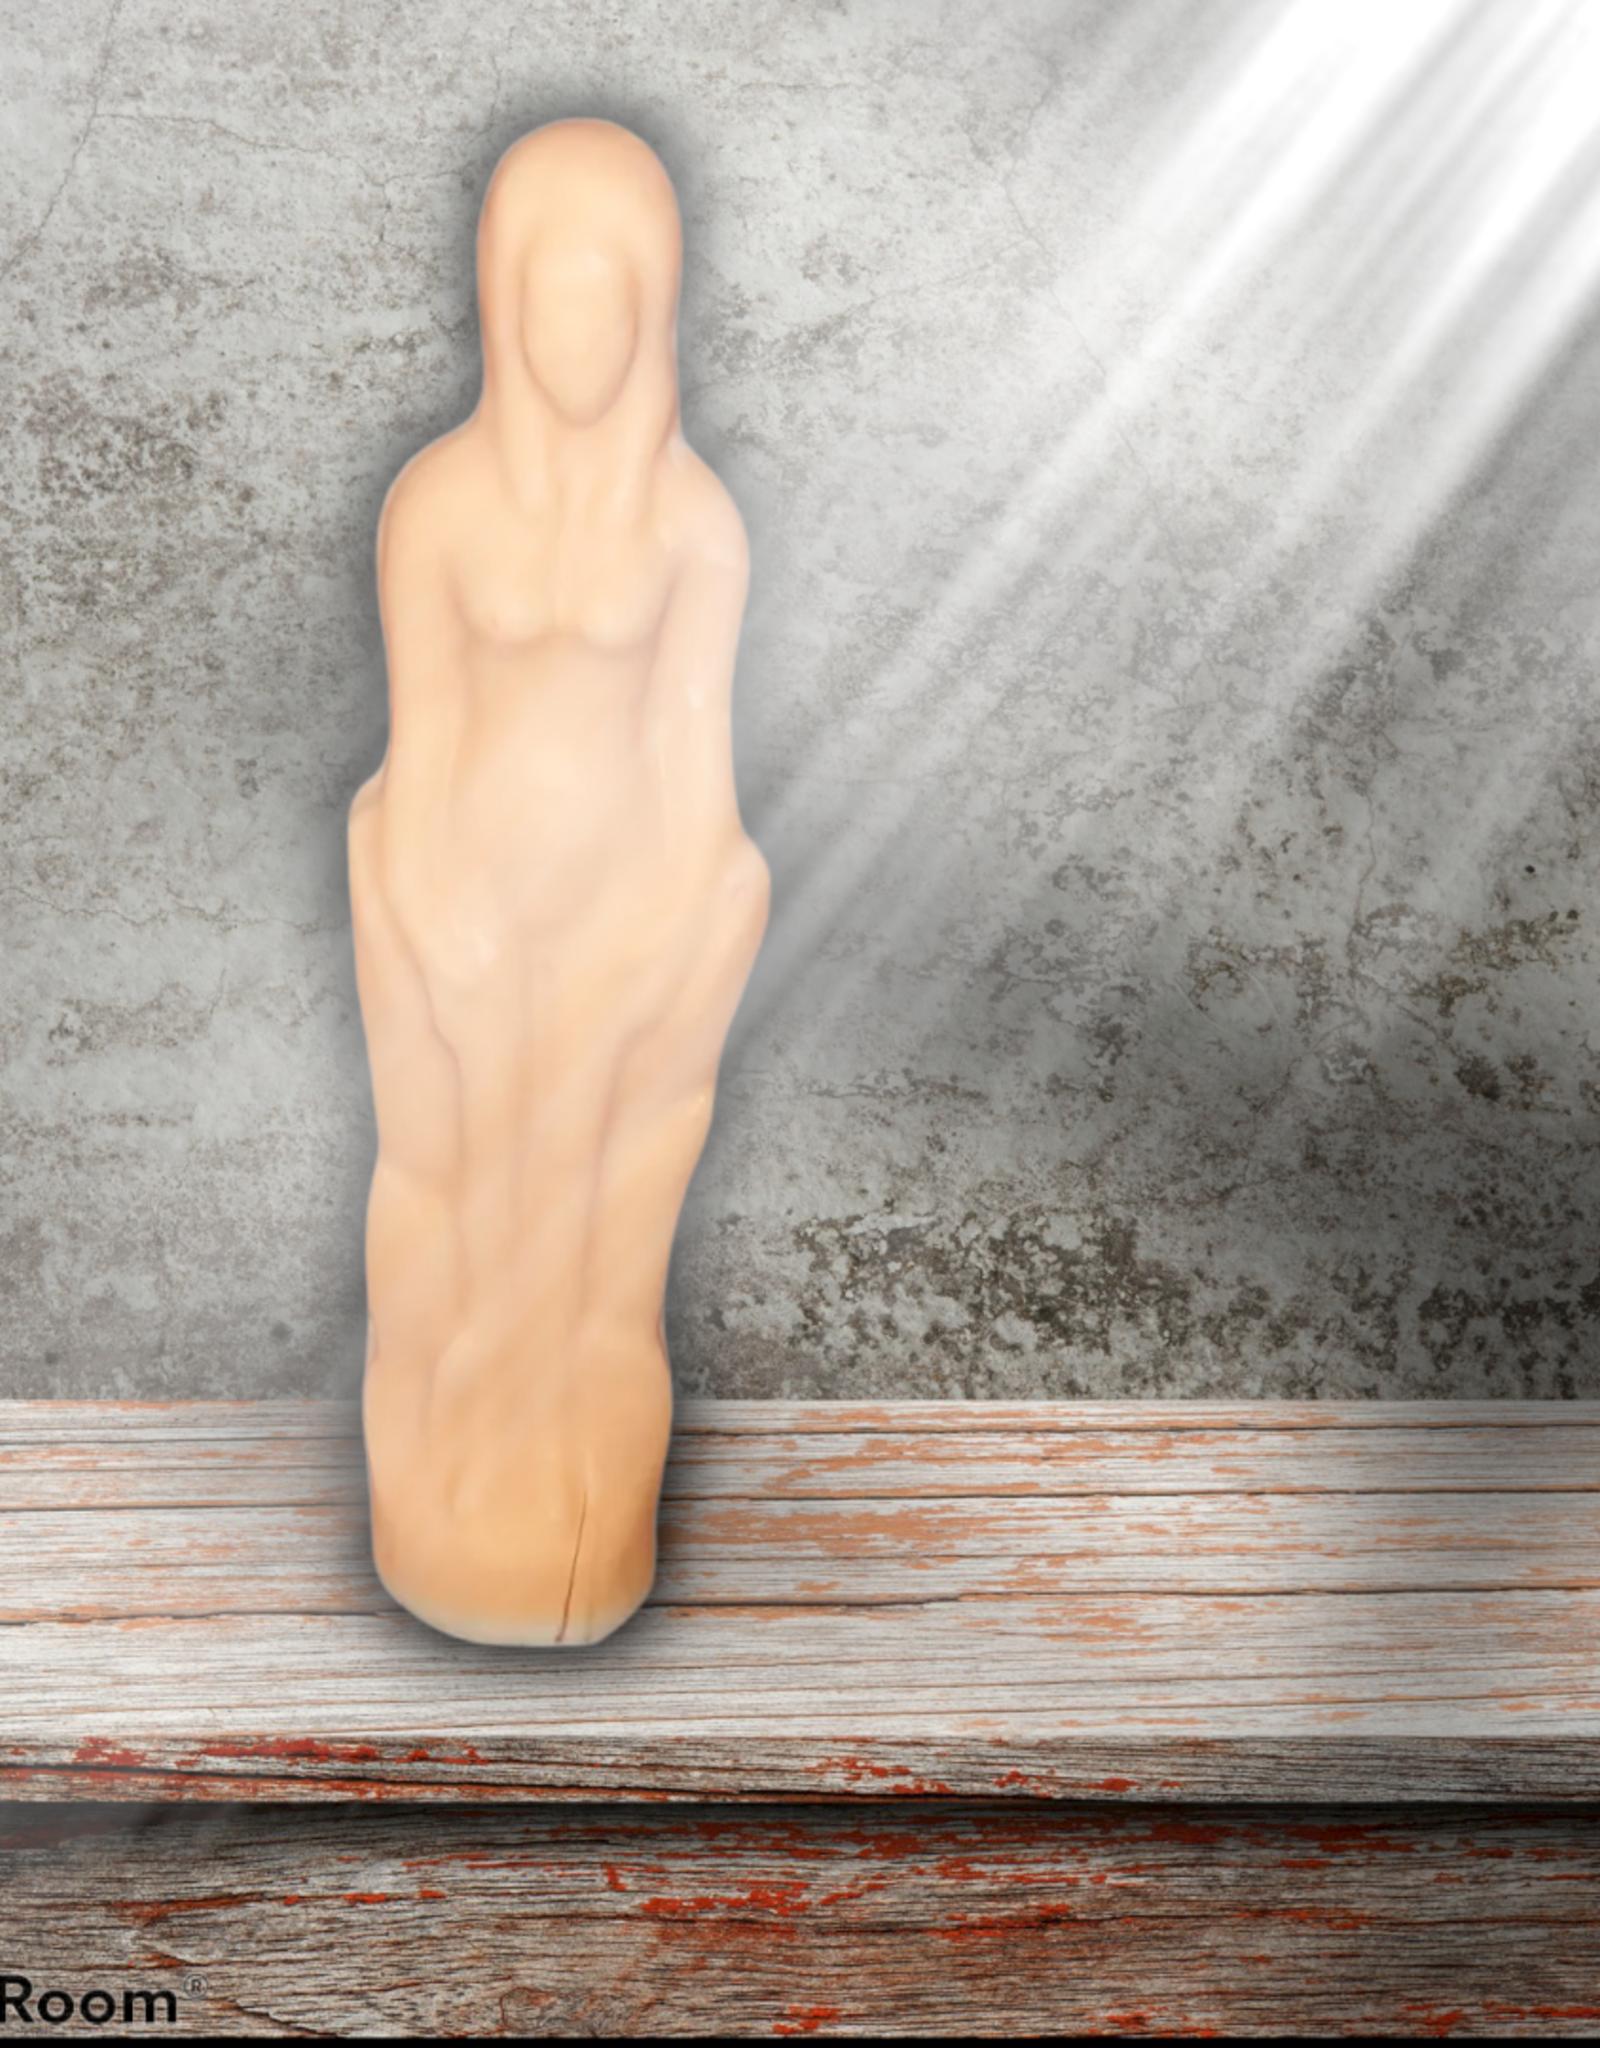 seazido - wevyra female candle